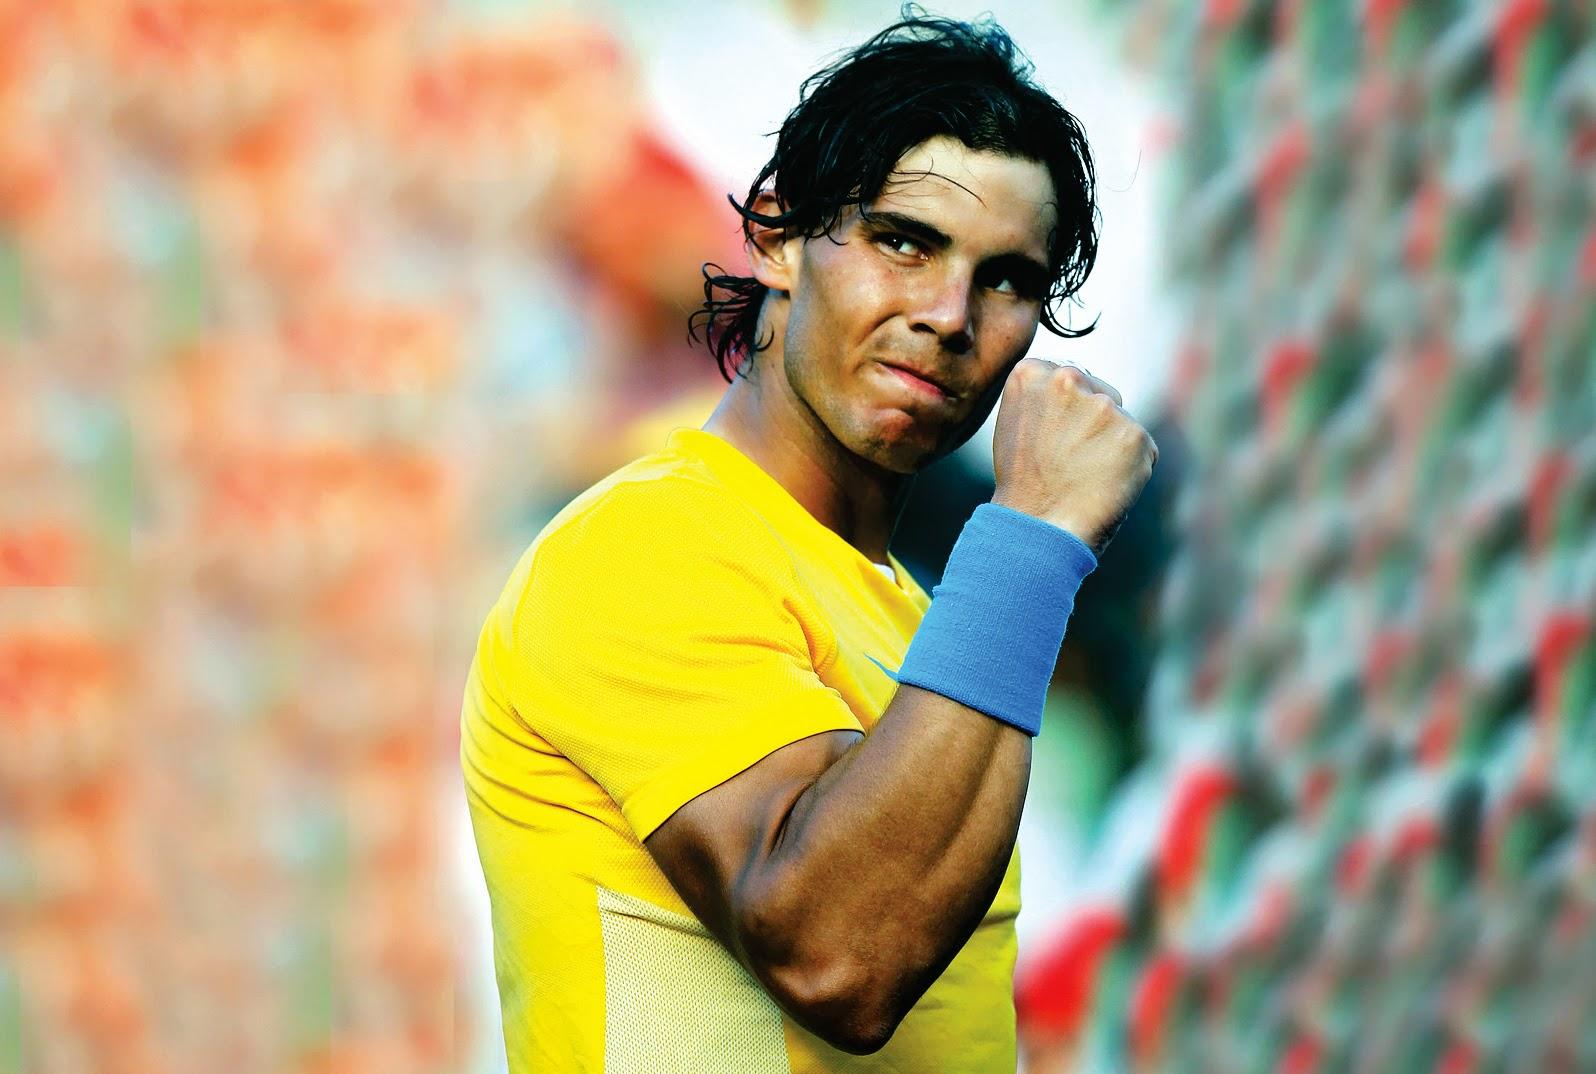 Nadal Hd: Tennis World: Rafael Nadal Hd Wallpapers 2014-15